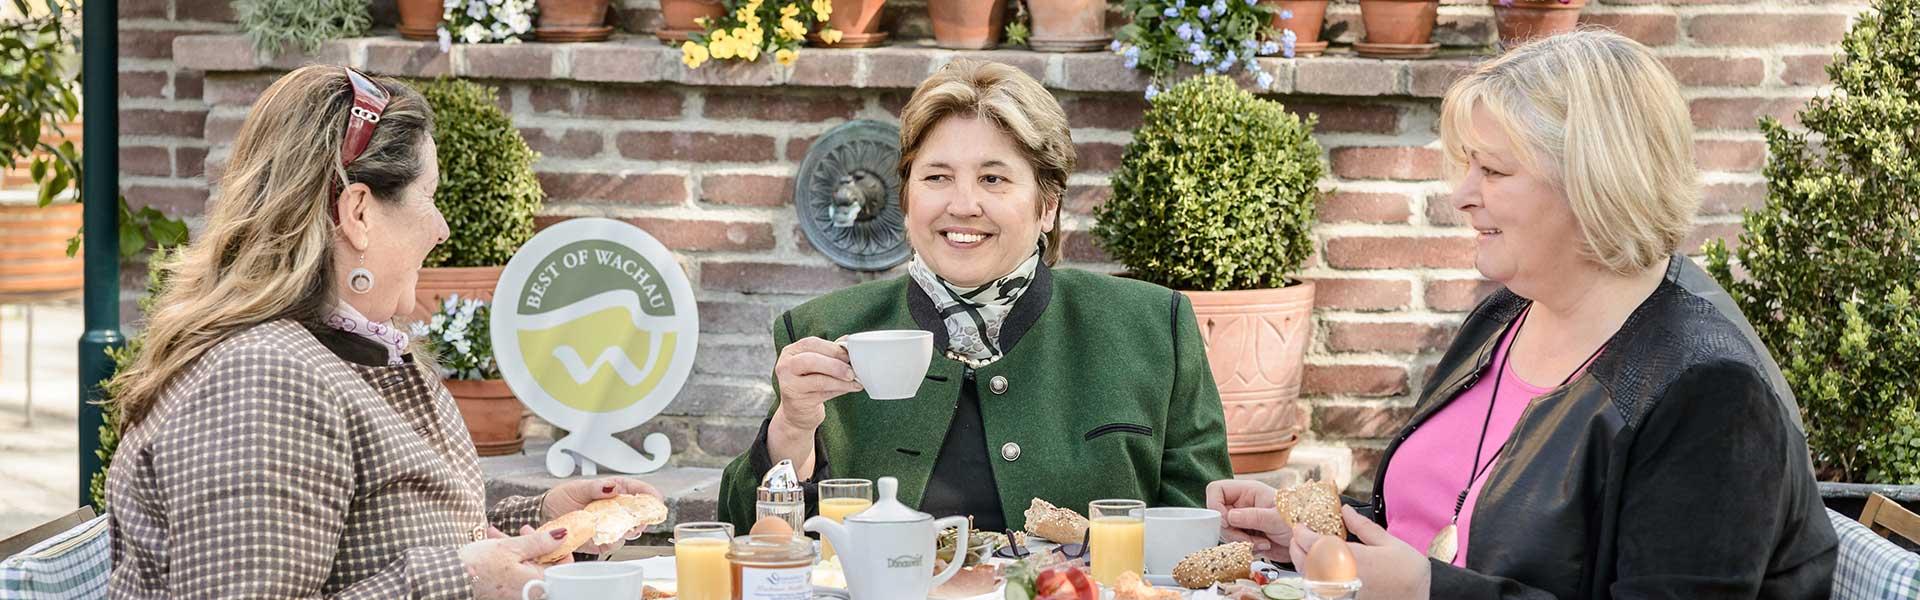 Donauwirt Frühstück